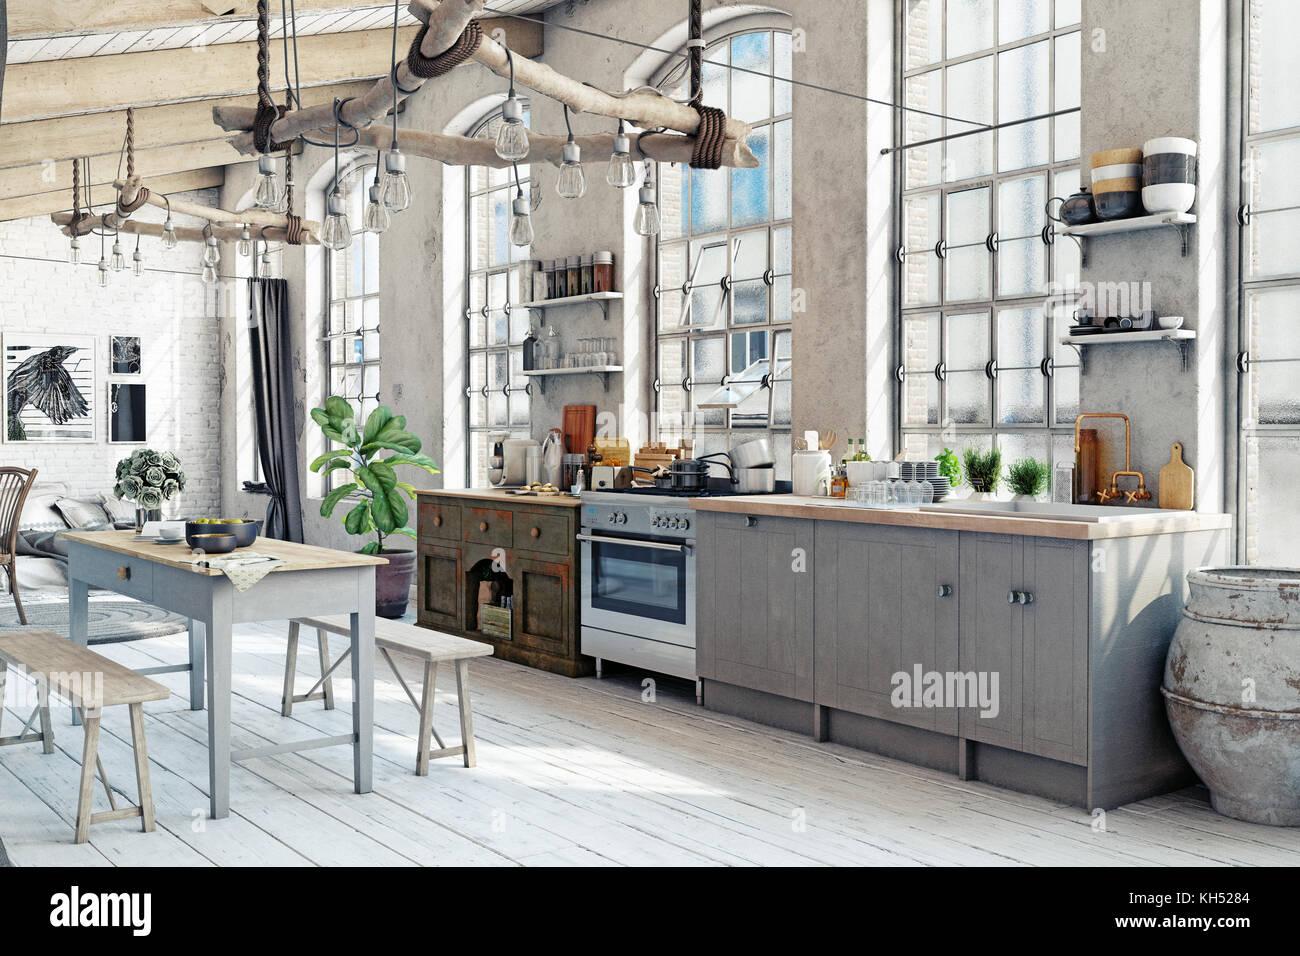 Attic loft kitchen interior. 3d rendering concept - Stock Image